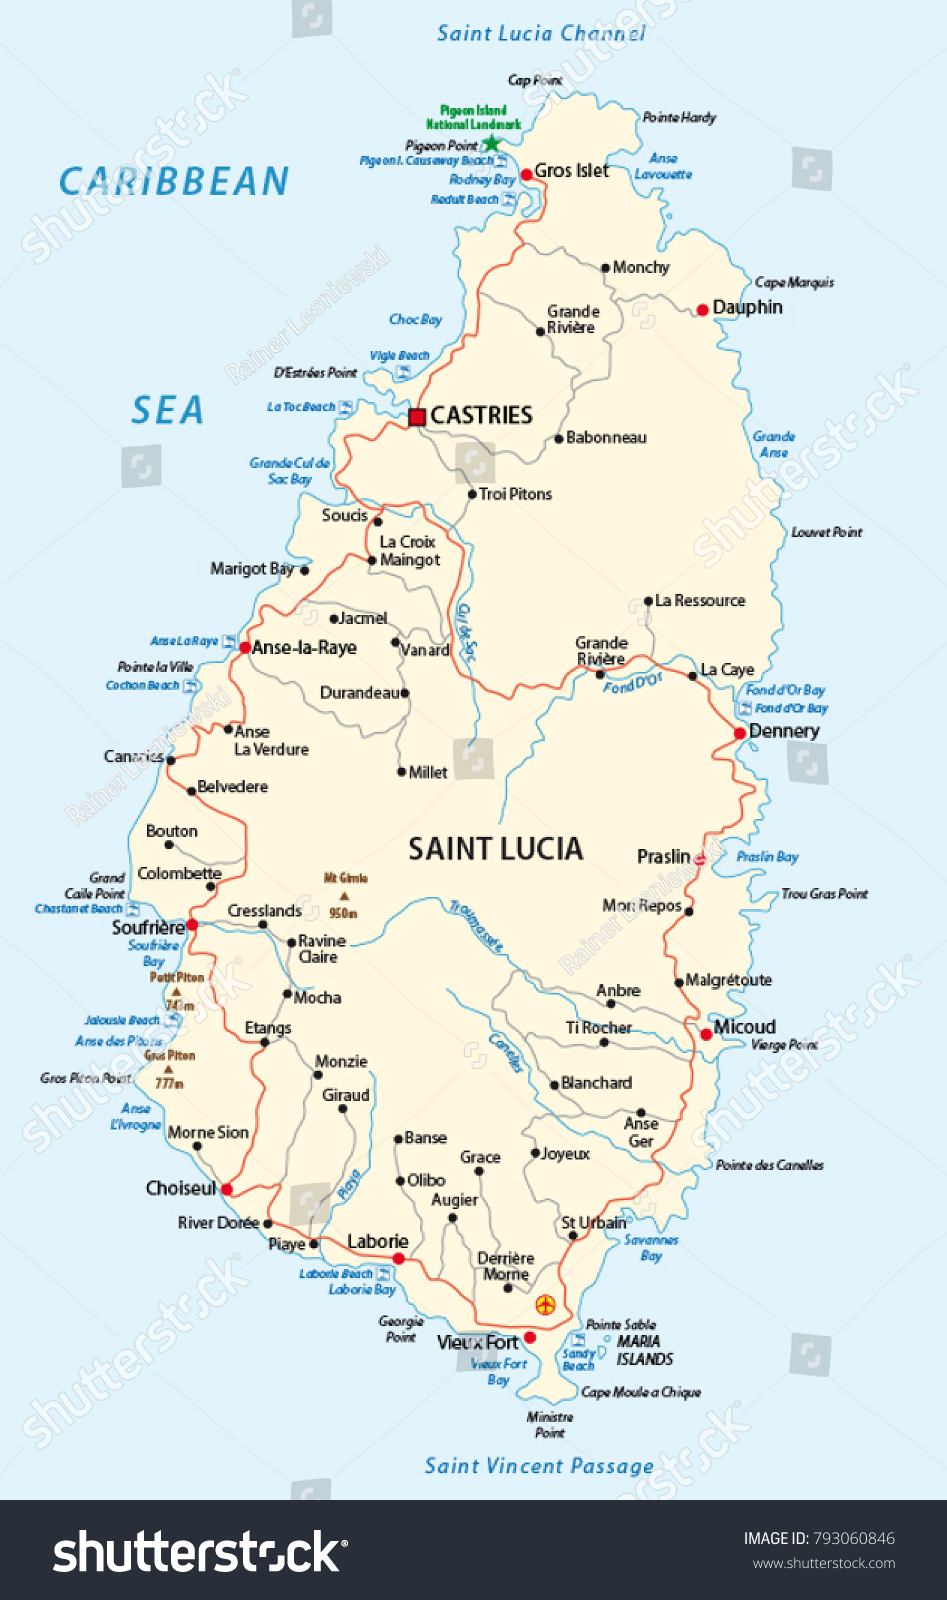 st lucia map beaches Saint Lucia Road Beach Vector Map Stock Vector Royalty Free st lucia map beaches